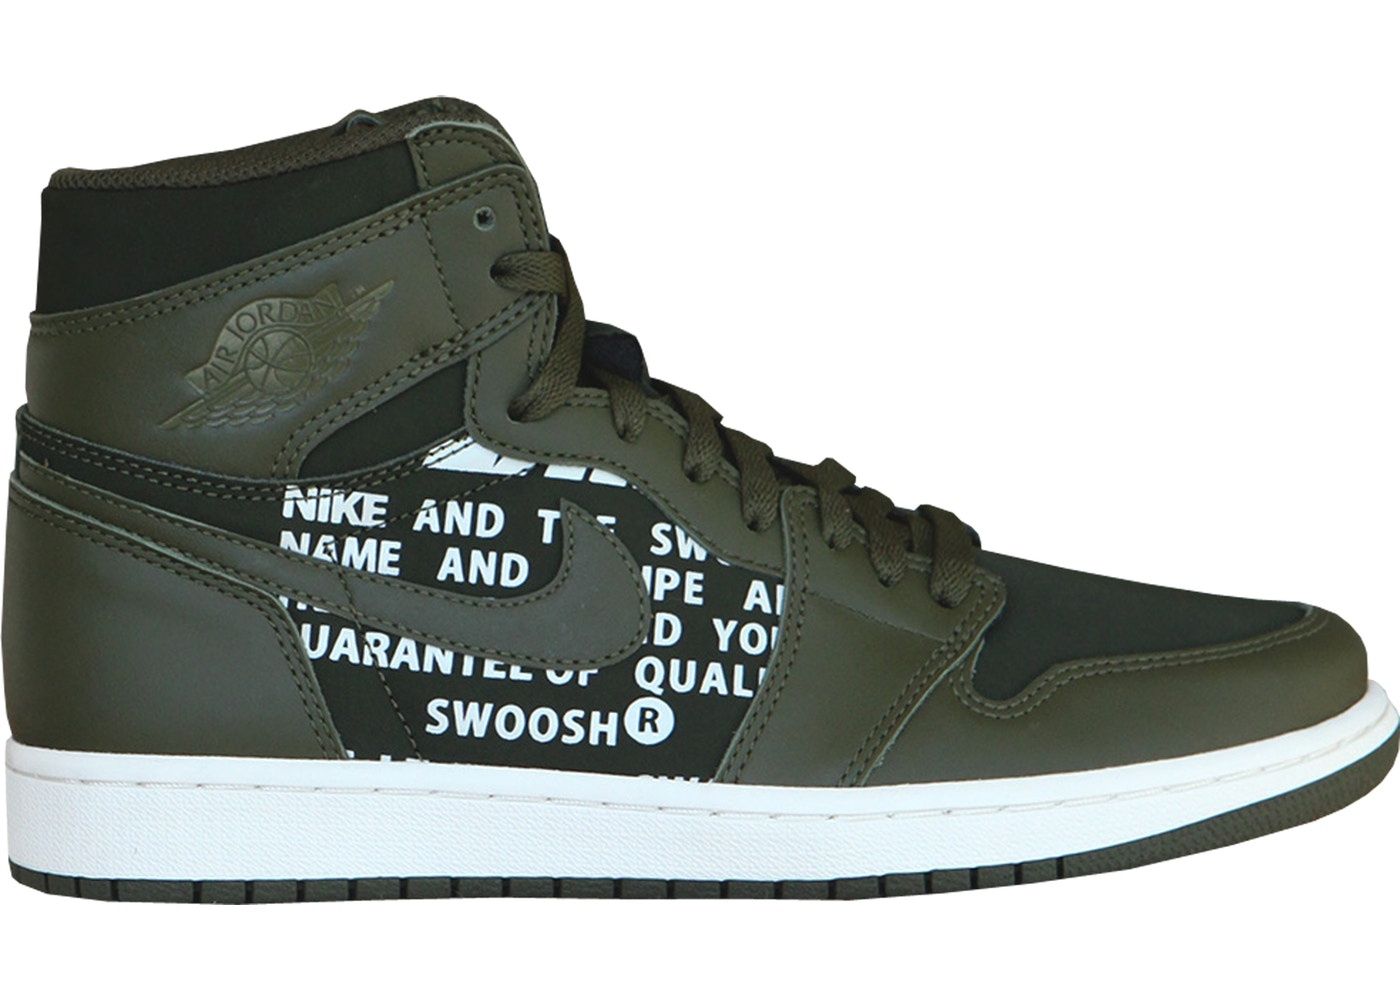 buy popular 8ac9a e2339 Air Jordan 1 Size 13 Shoes - Volatility